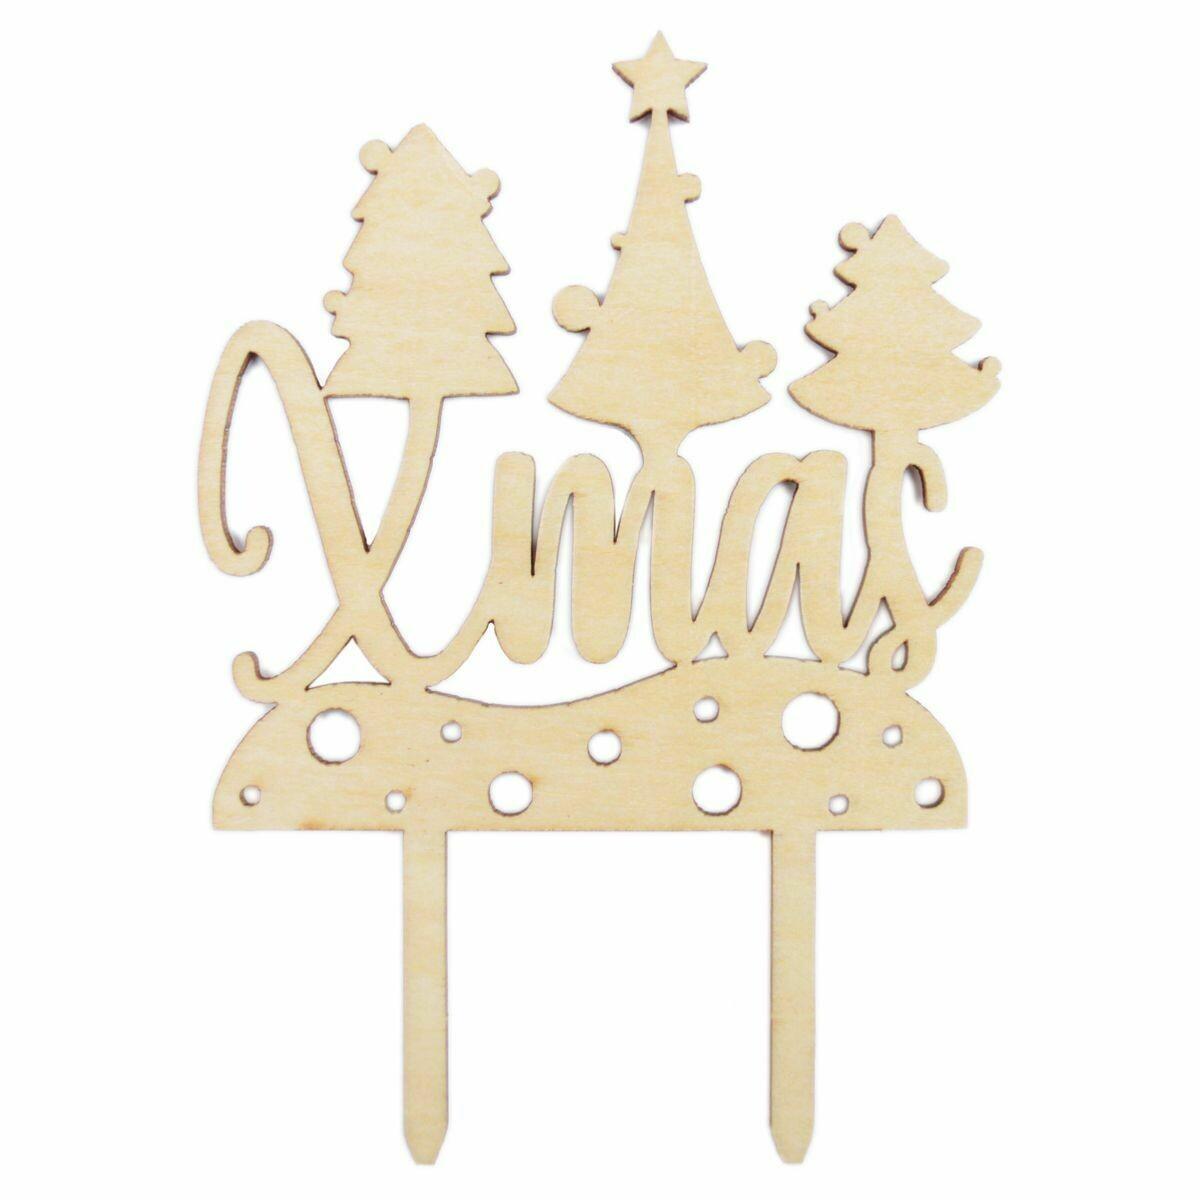 Scrapcooking Cake Topper Wood 'Xmas' - Ξύλινο Τόπερ Χριστουγεννιάτικο